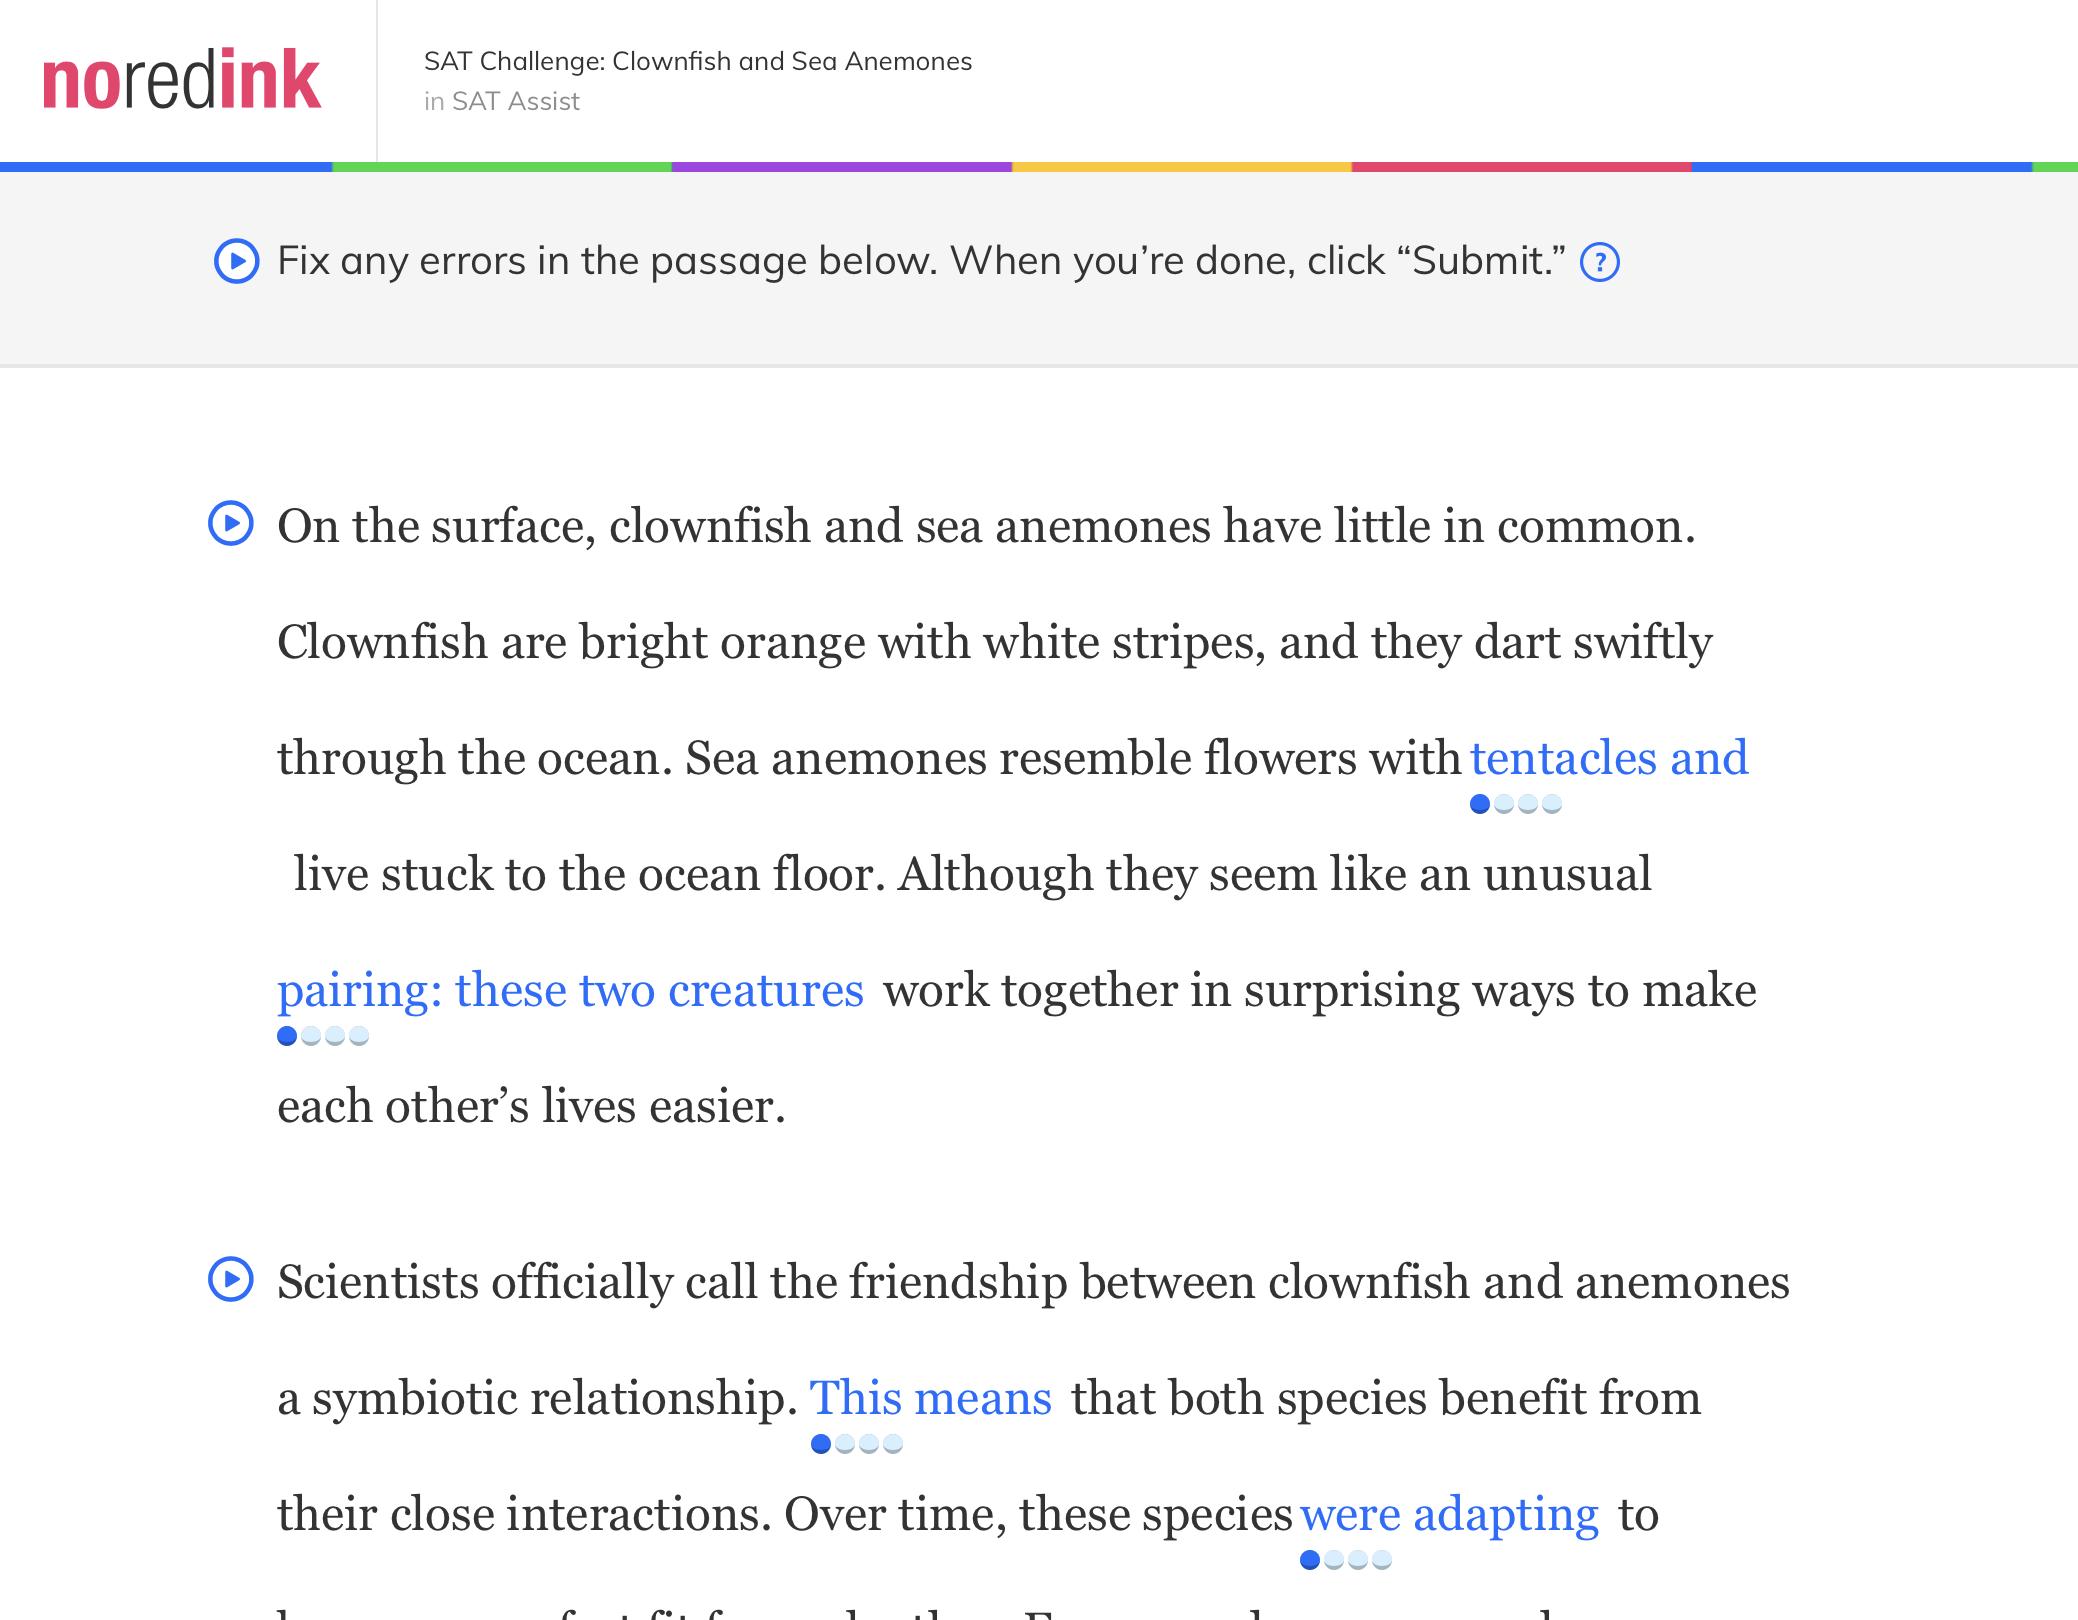 Noredink answers key - lkeepanexmis